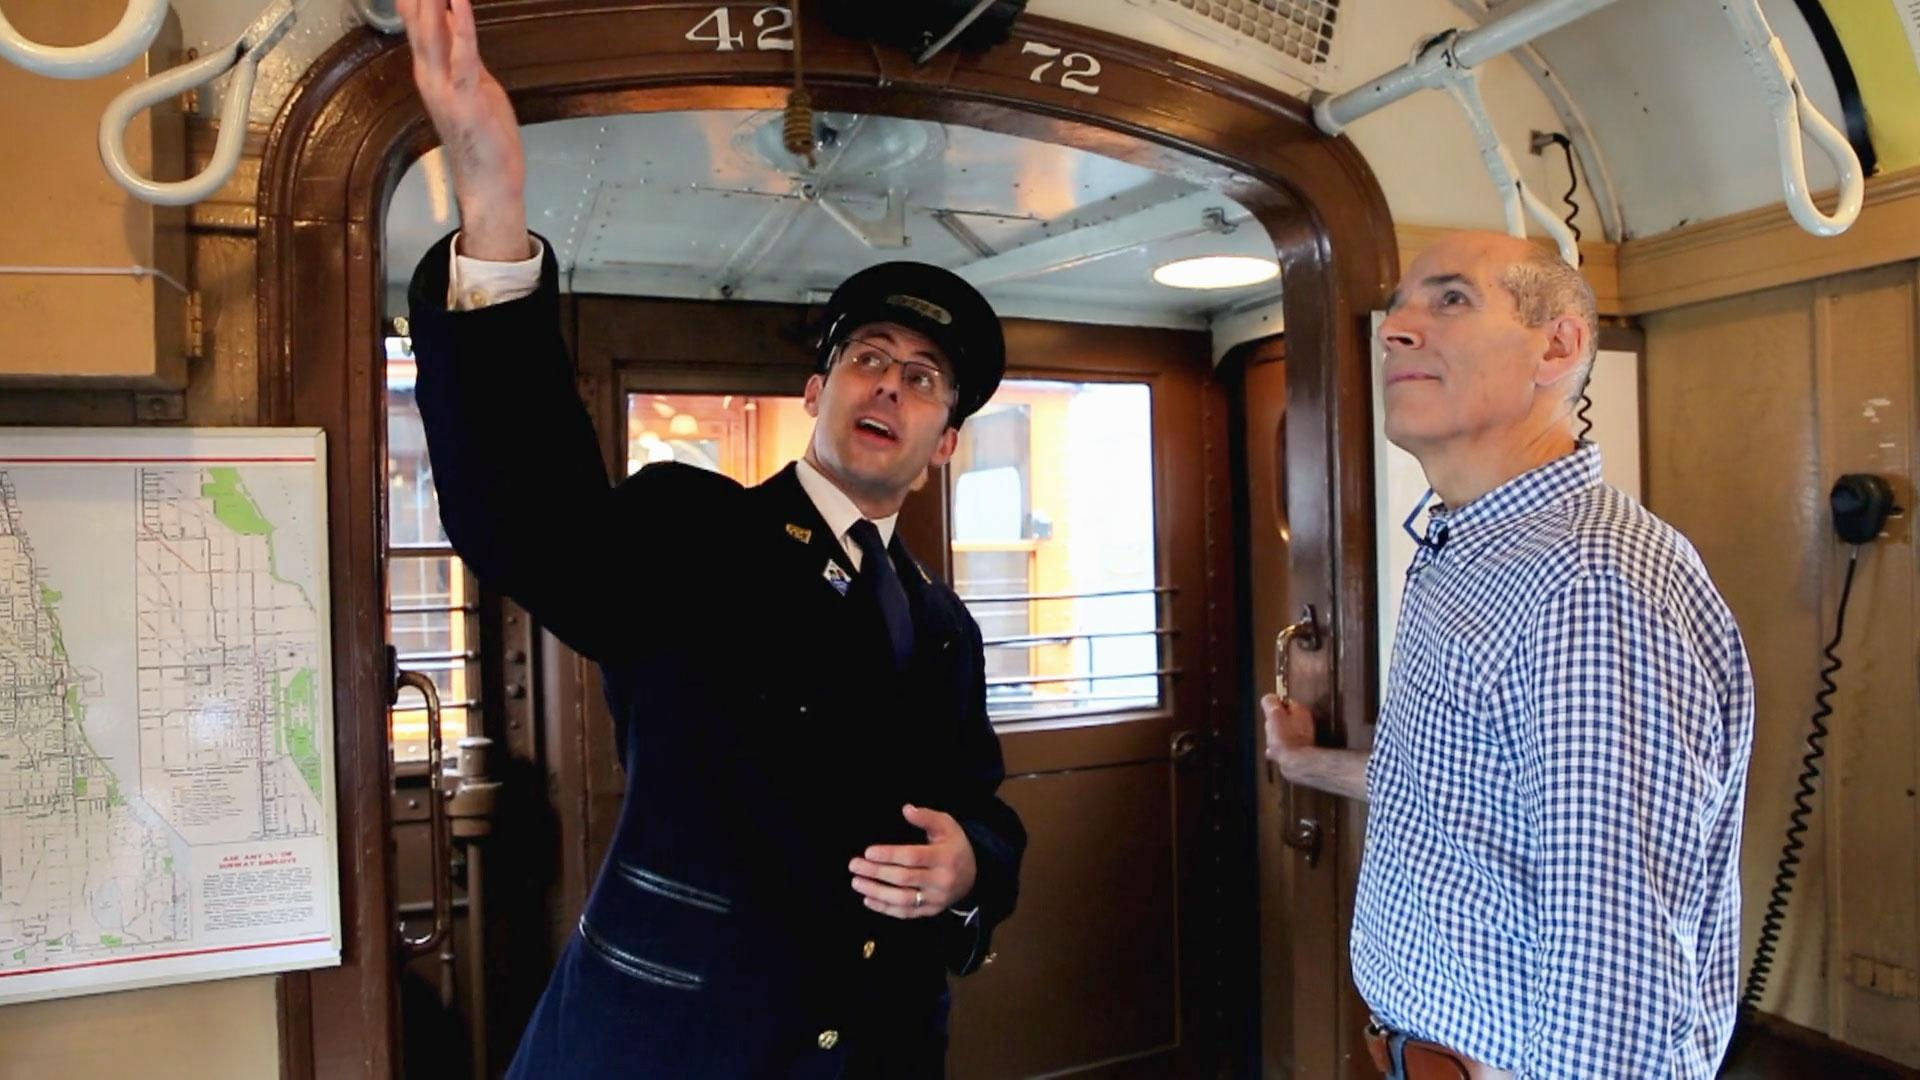 1920s-Era 'L' Train